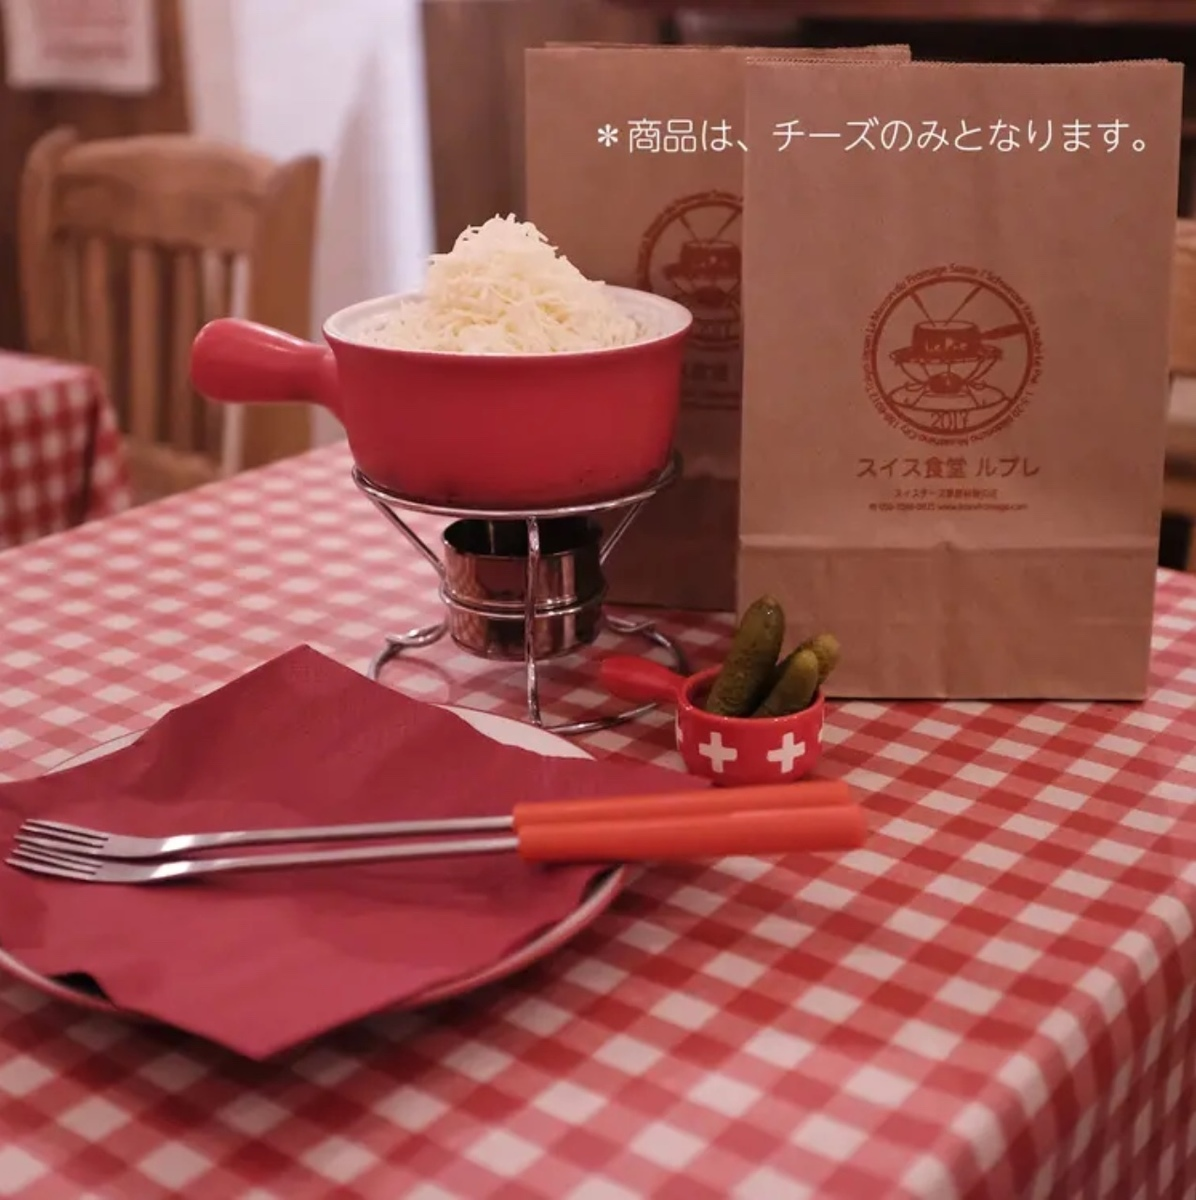 Lepre チーズフォンデュミックス(Classic)180g/1~2人前【1,800円】